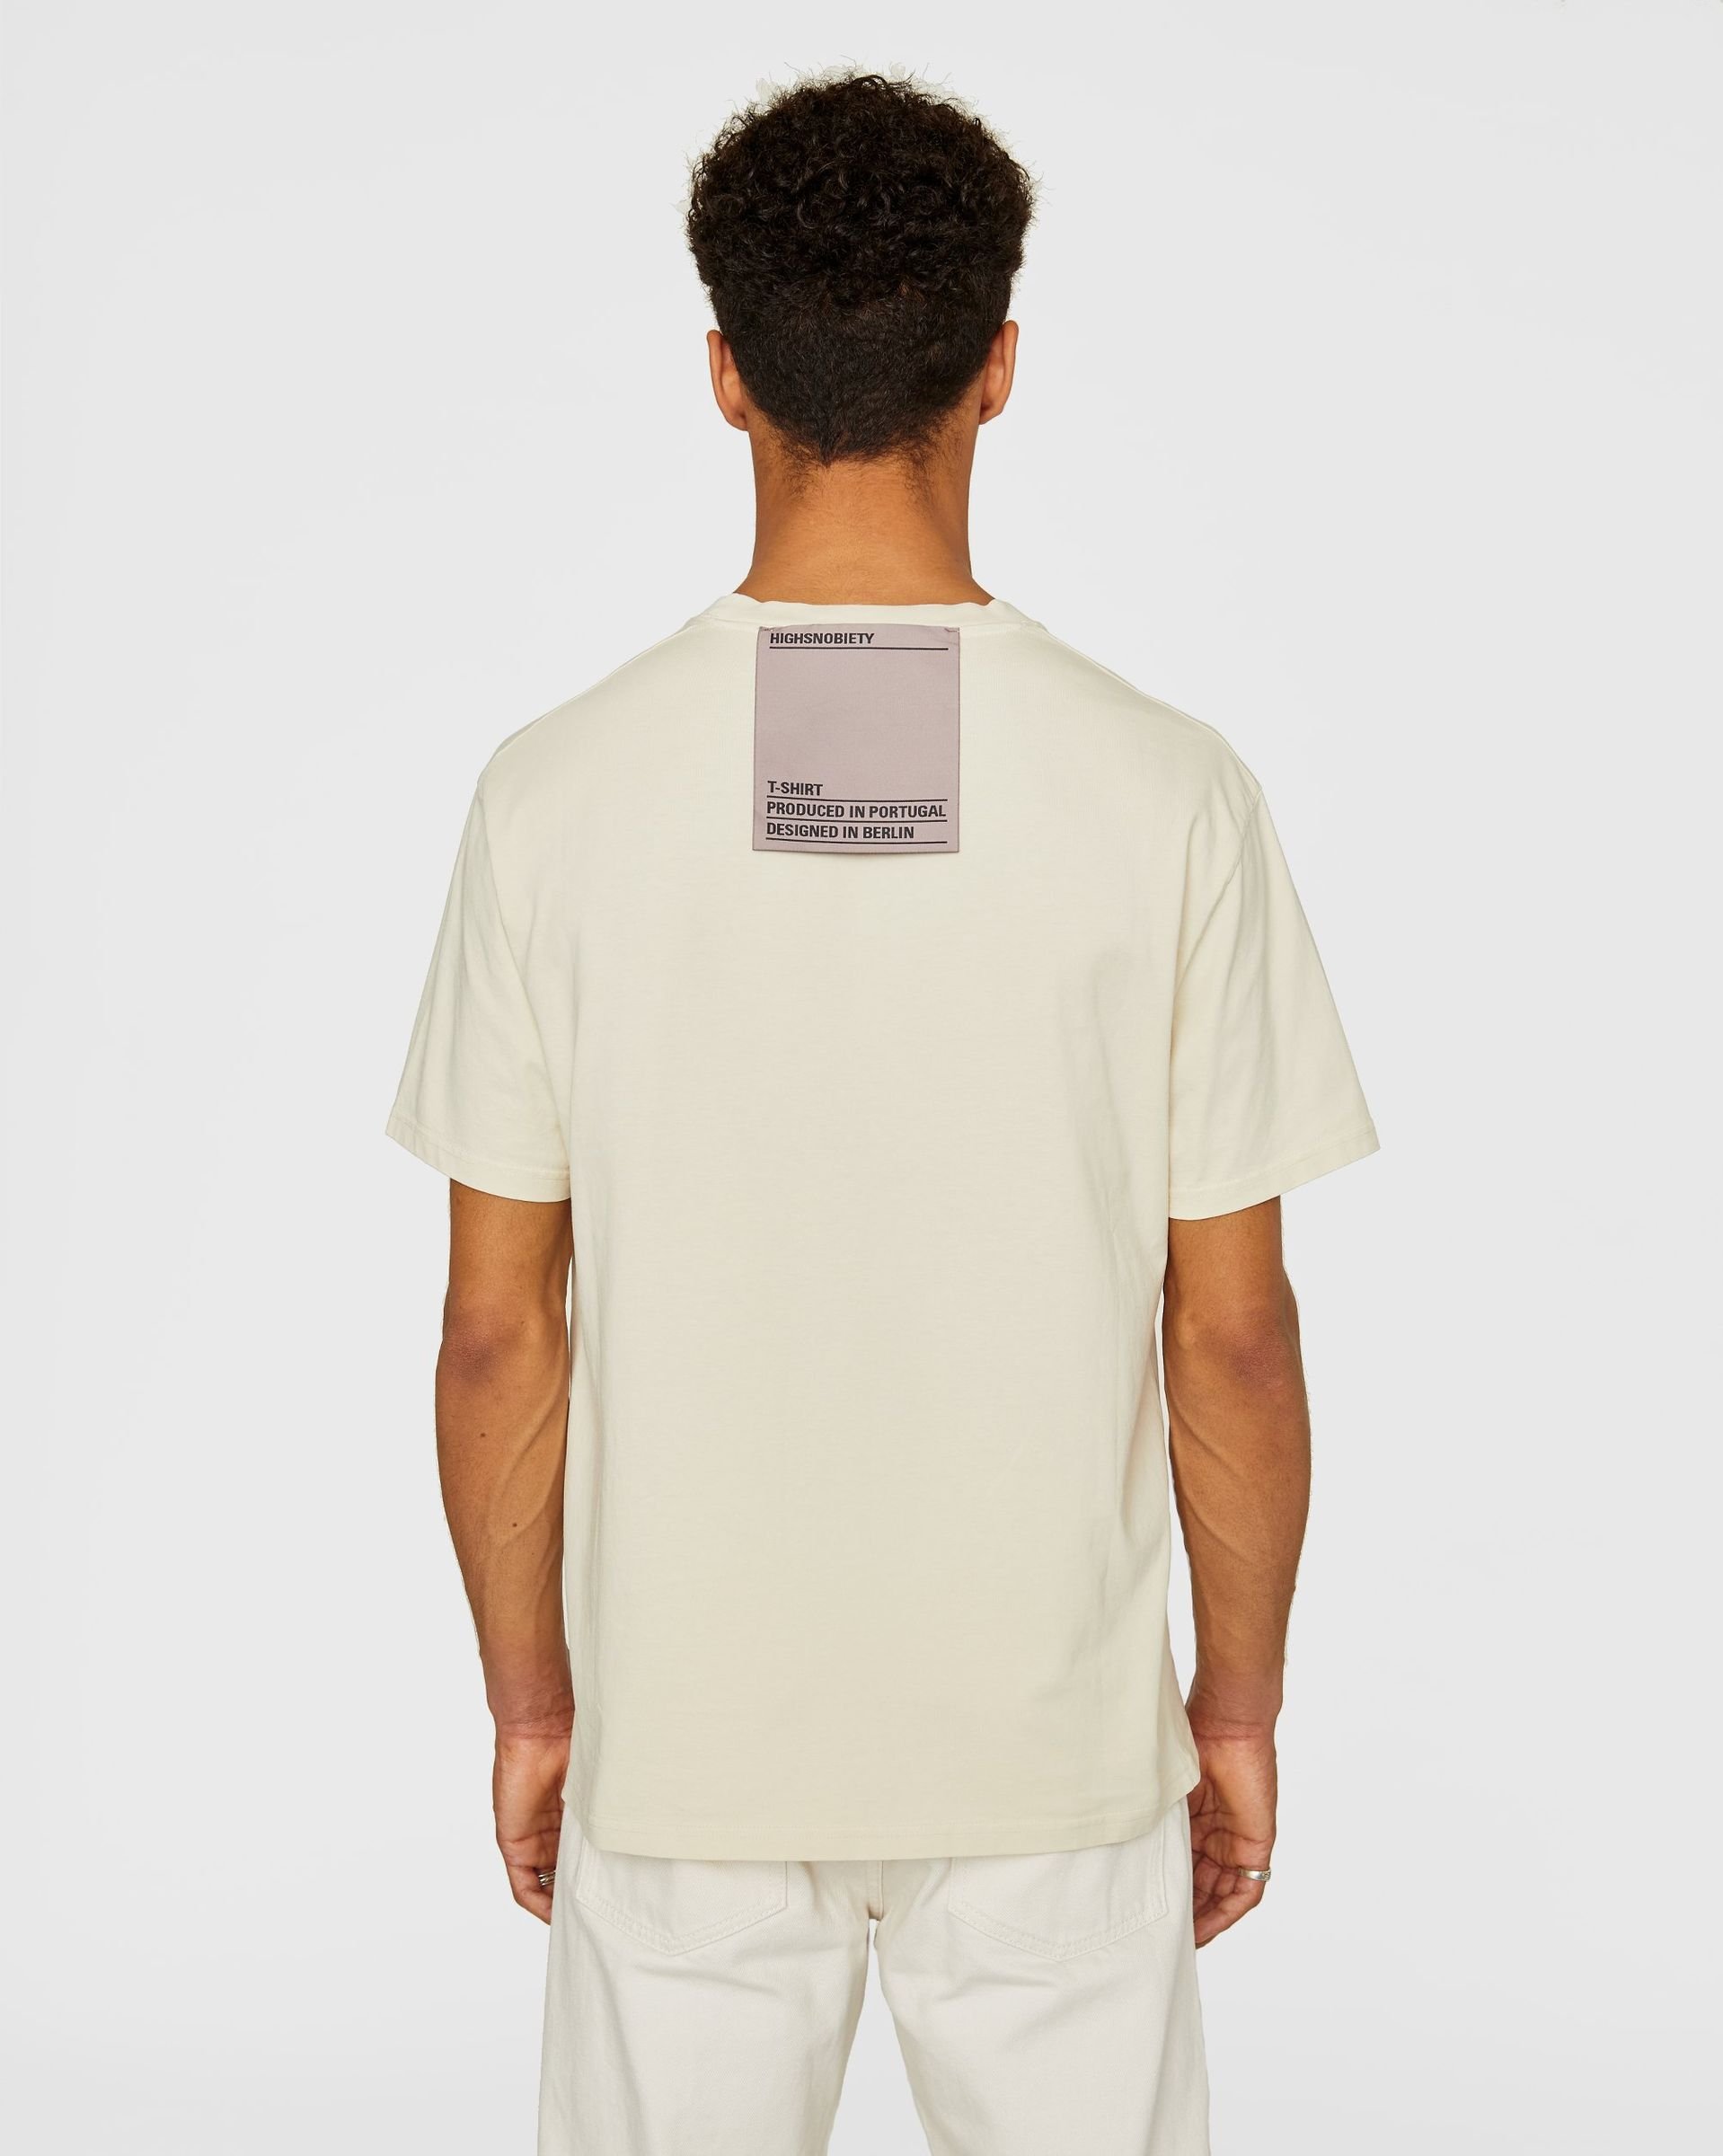 Highsnobiety Staples - T-Shirt Eggshell - Image 3